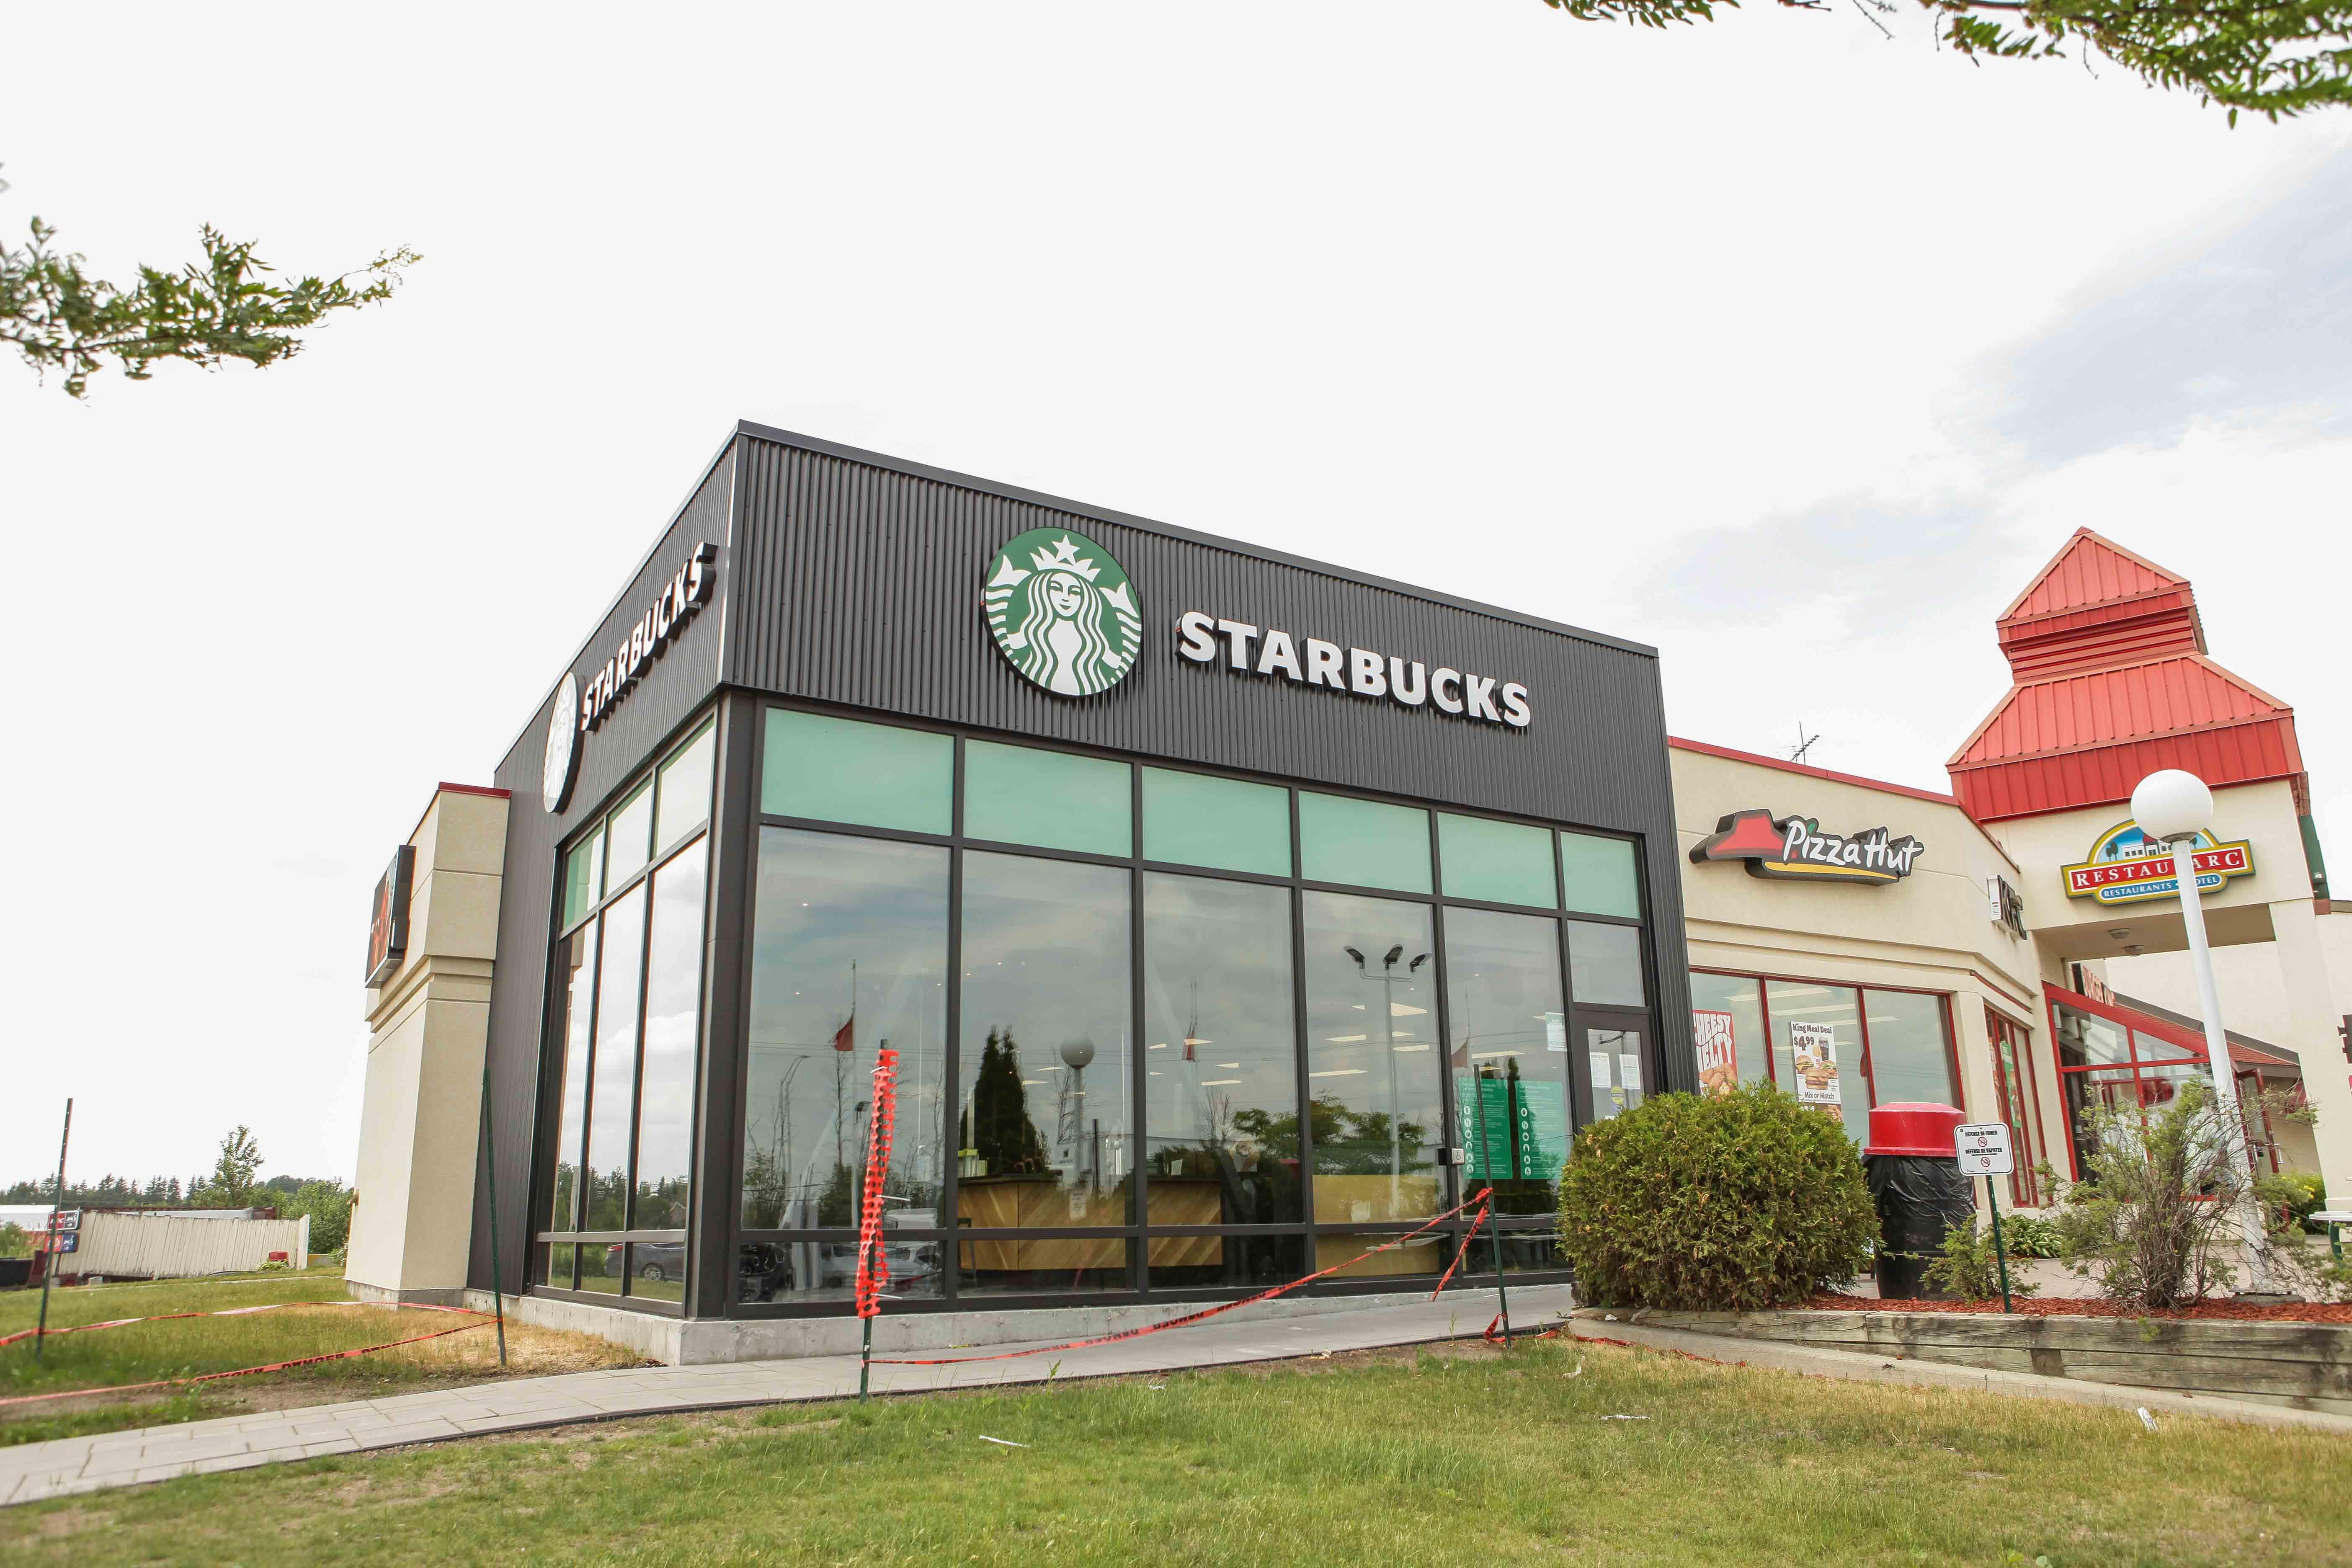 Exterior photo of Starbucks in Casselman